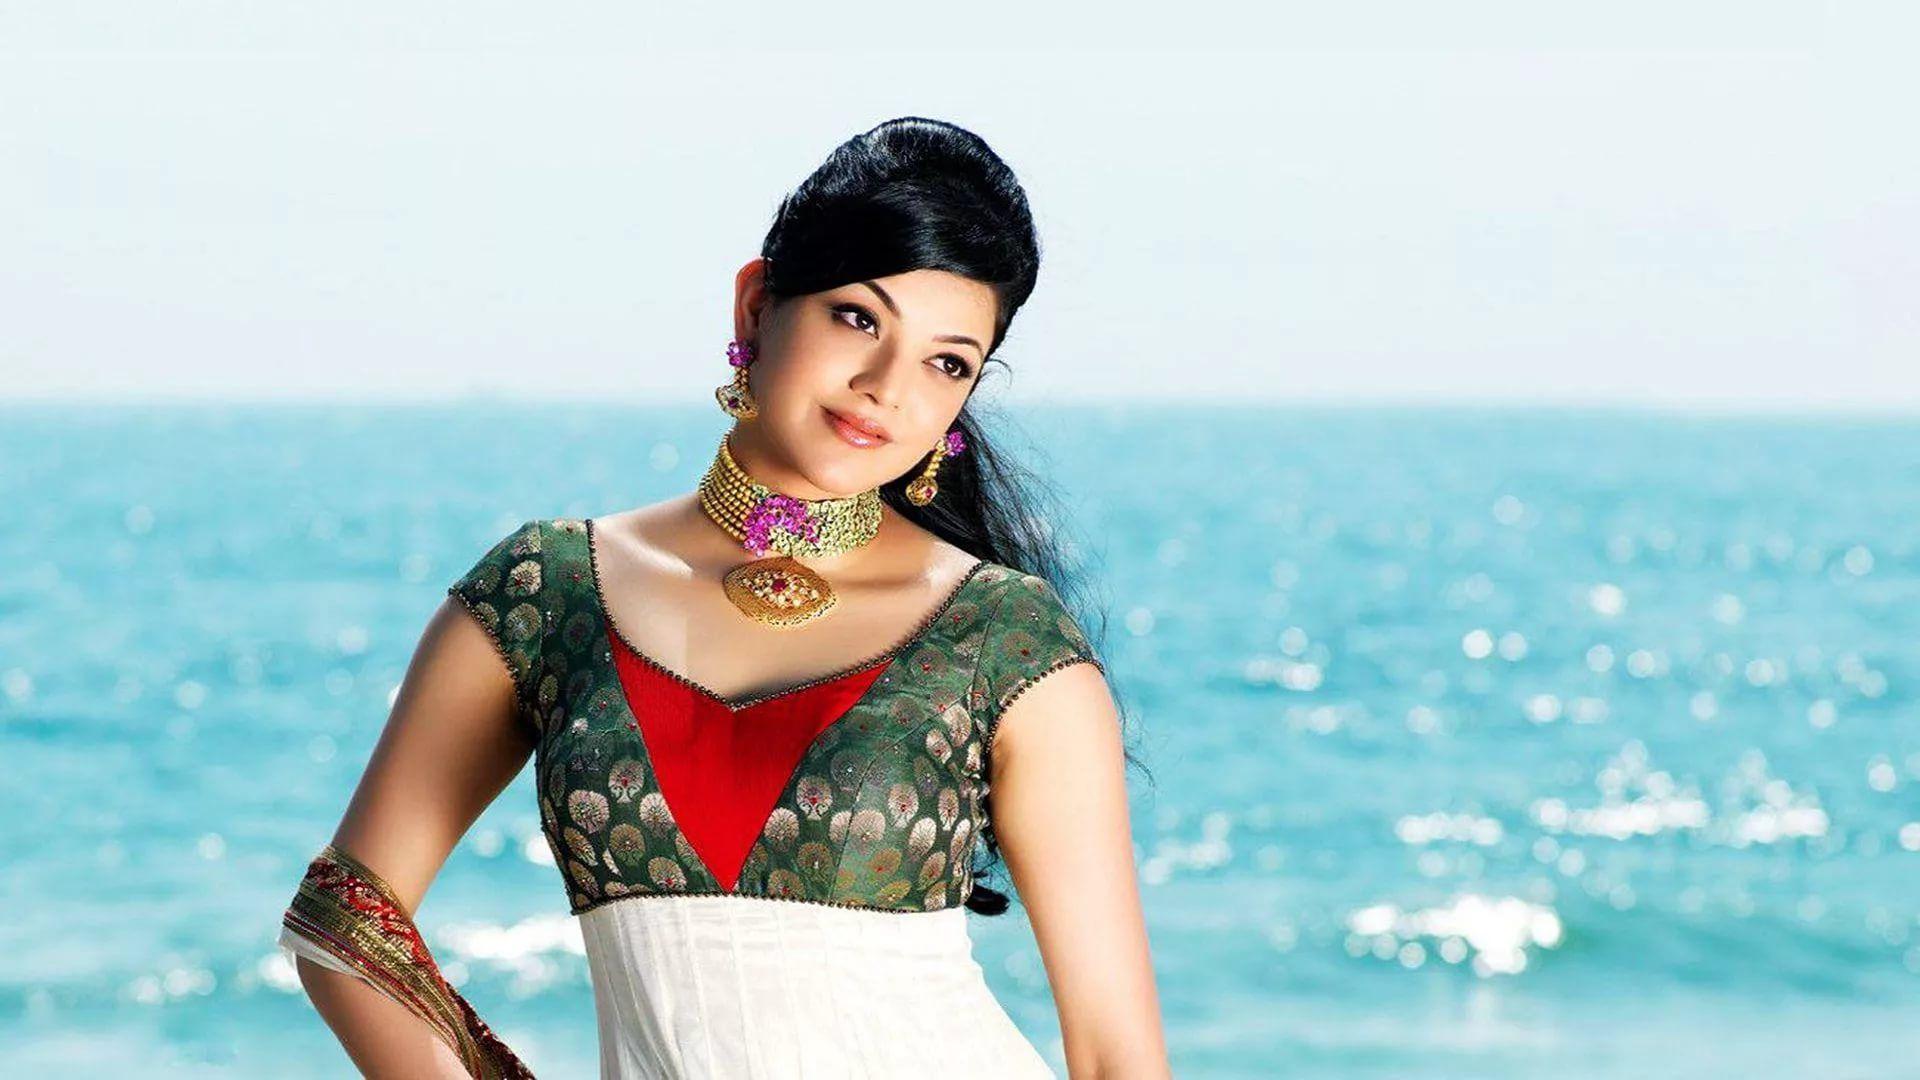 South Actress Hot High Resolution hd wallpaper